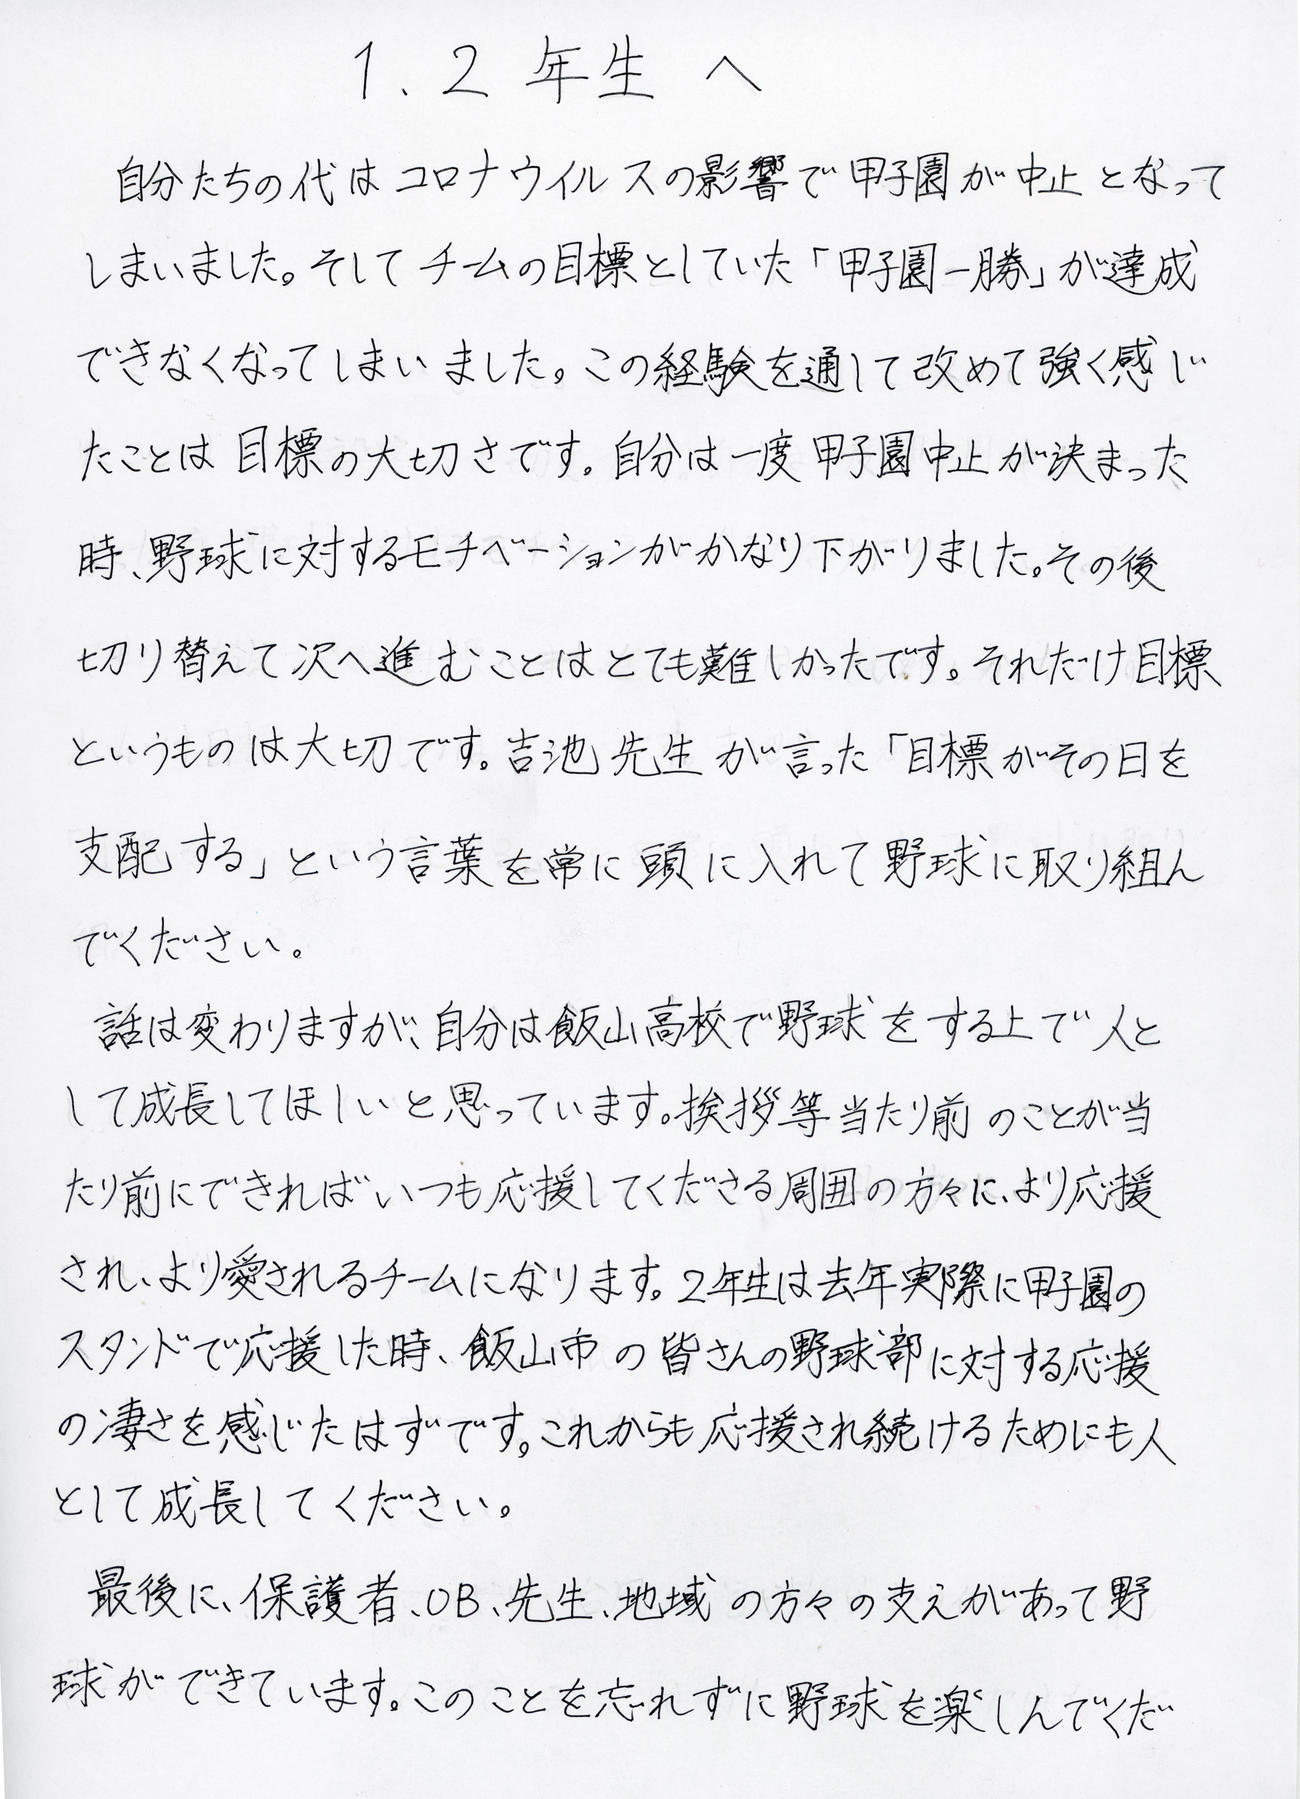 飯山・服部夕吾の手紙